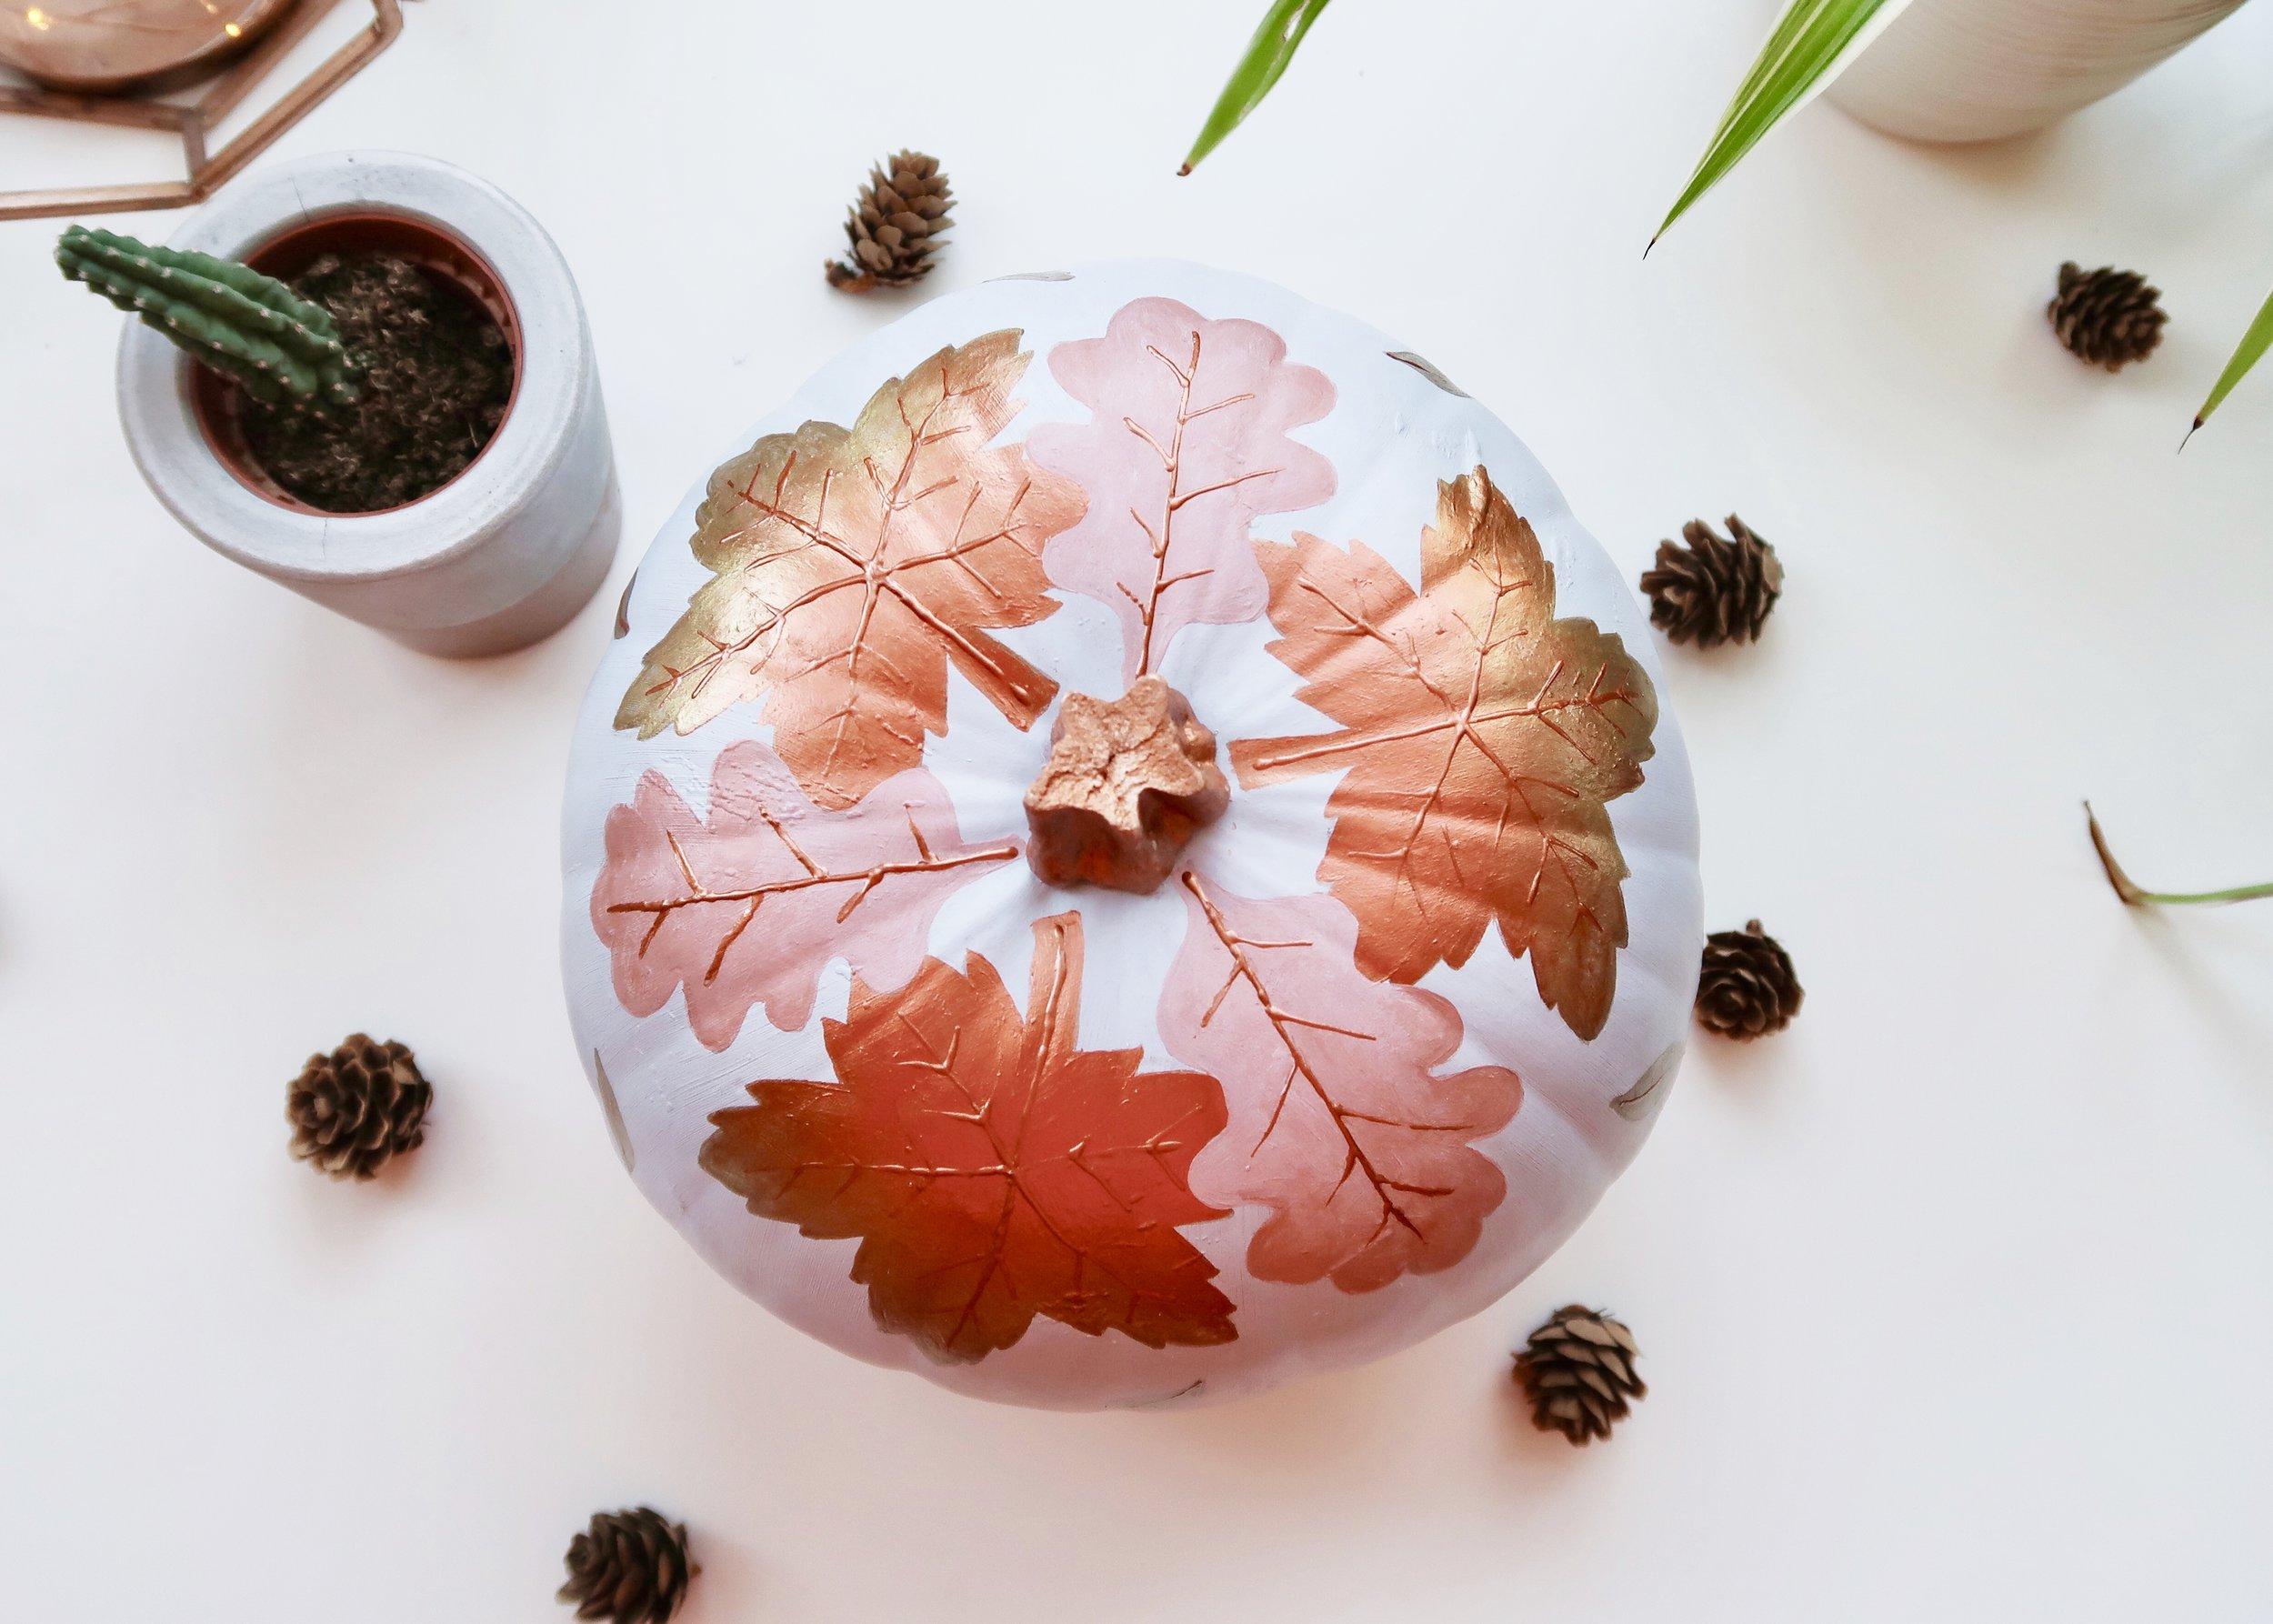 DIY Falling Leaves No-Carve Pumpkin by Isoscella